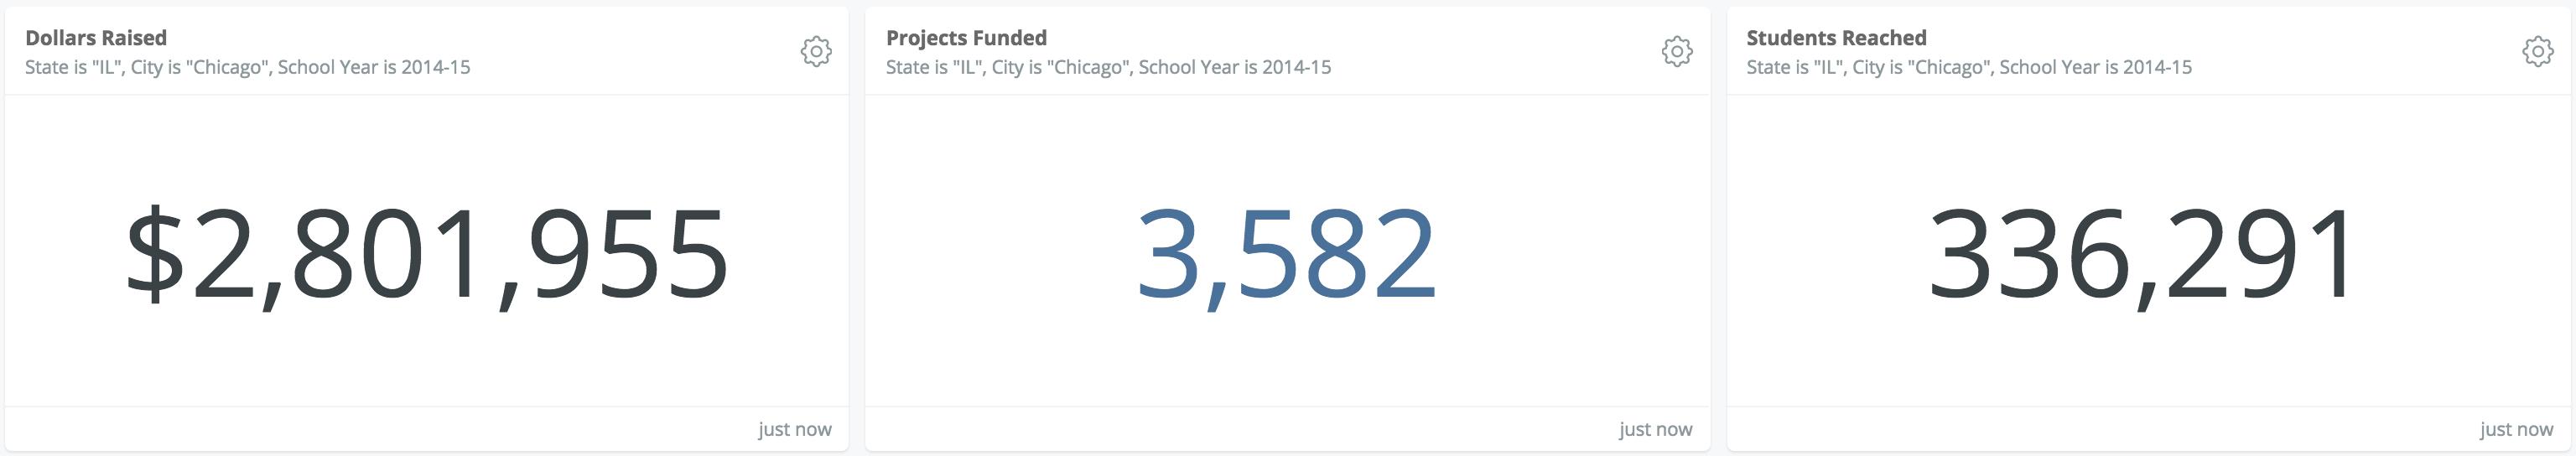 Chicago 2014-2015